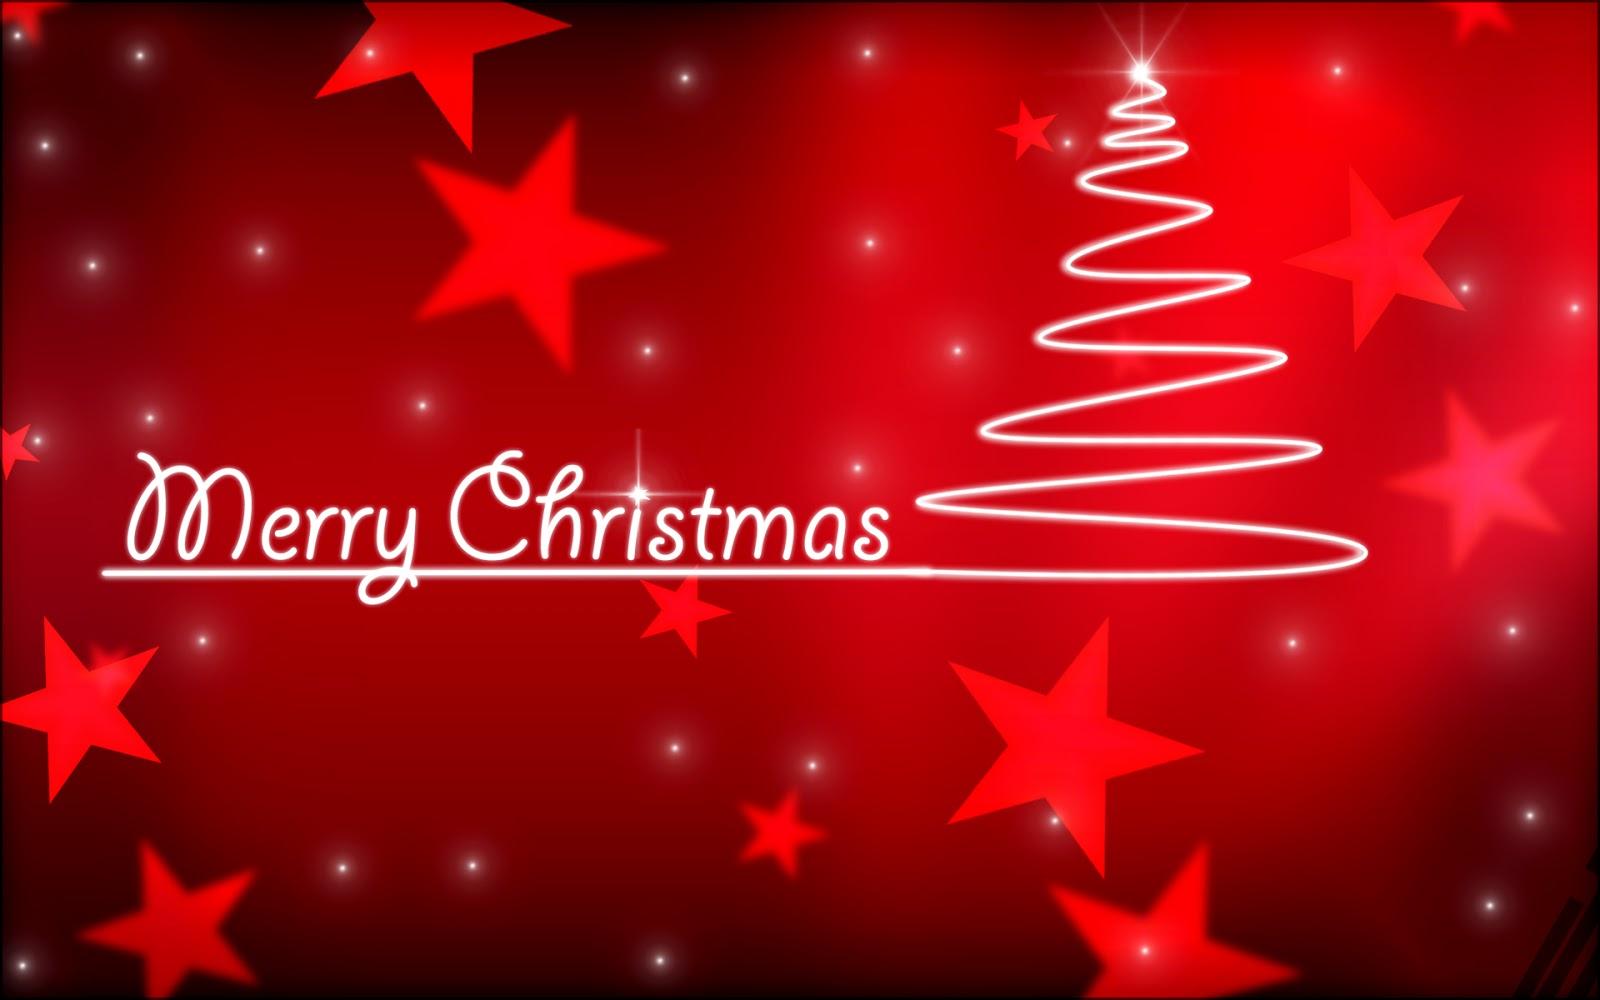 http://1.bp.blogspot.com/-I9xCWNwThjo/UNiHWh-swkI/AAAAAAAAJTg/UEP8WlrWgTQ/s1600/Merry+Cristmas+greeting+(16).jpg